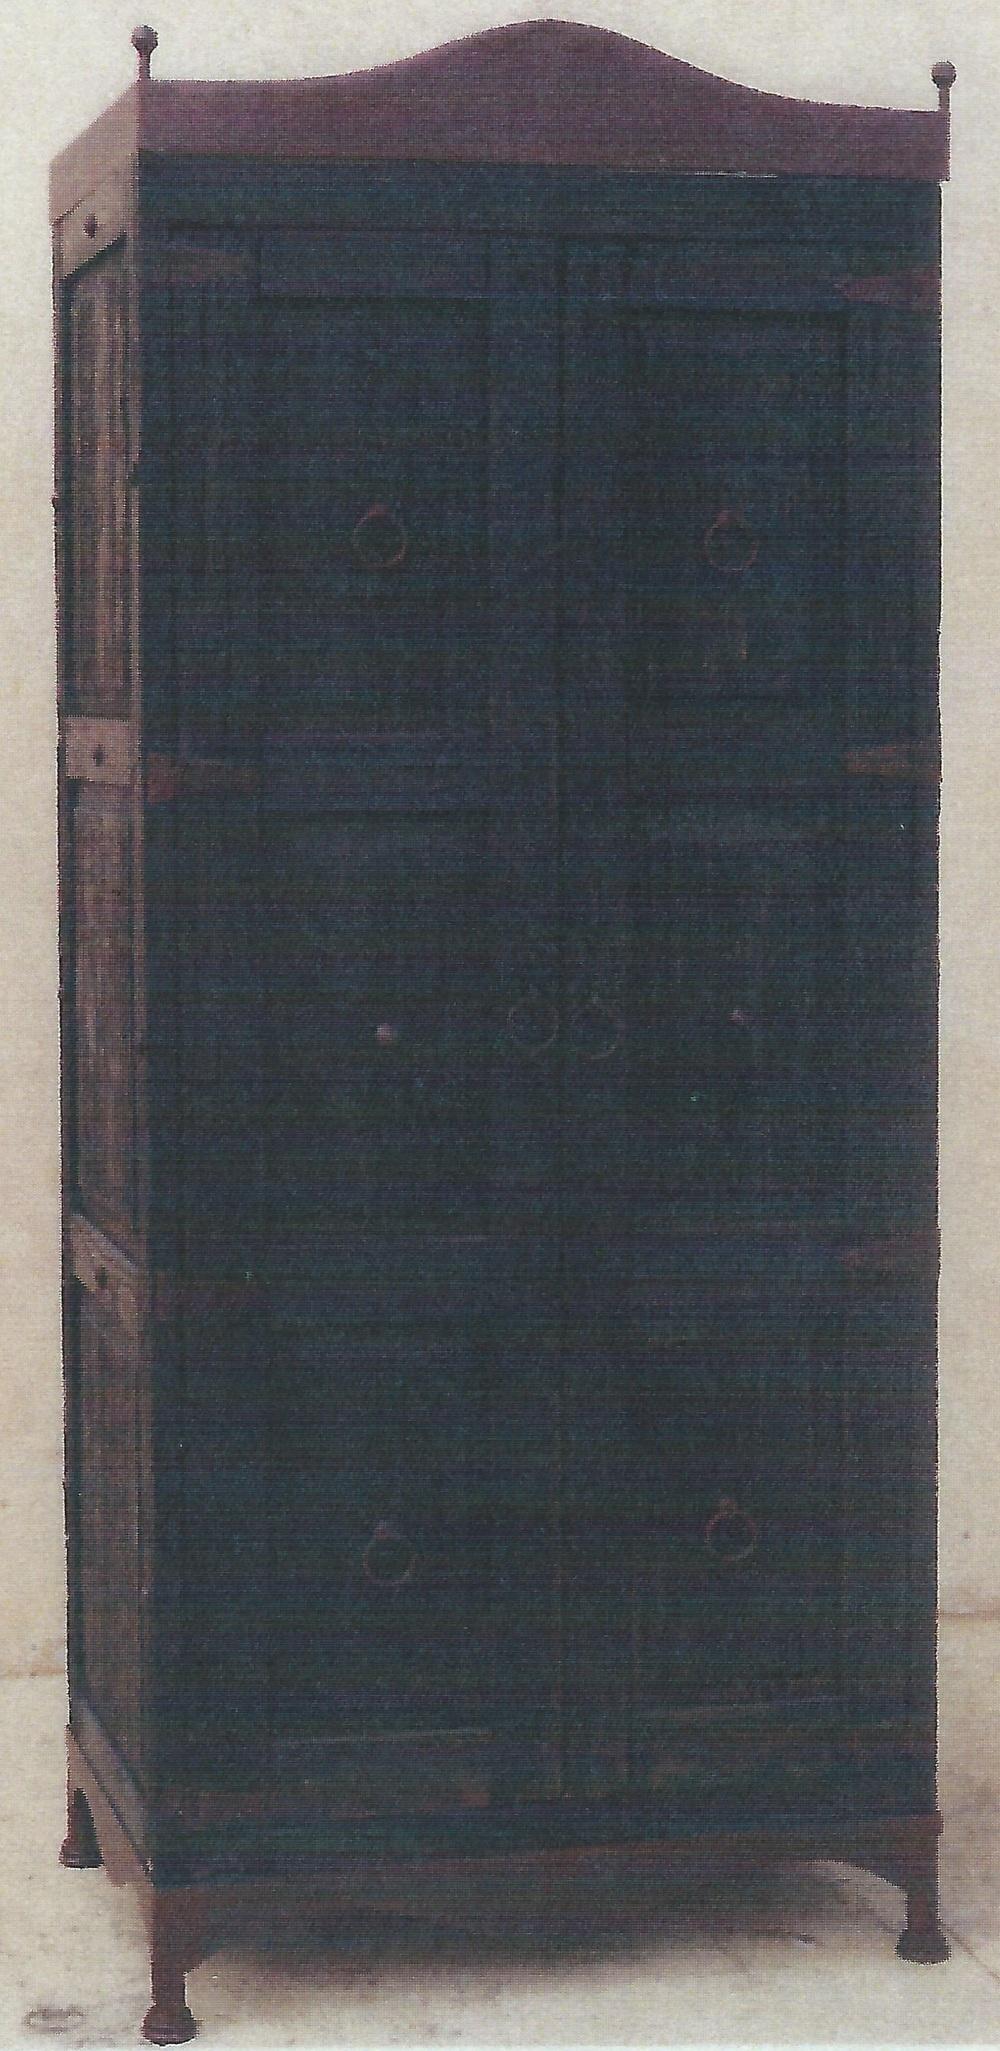 PA-AR010